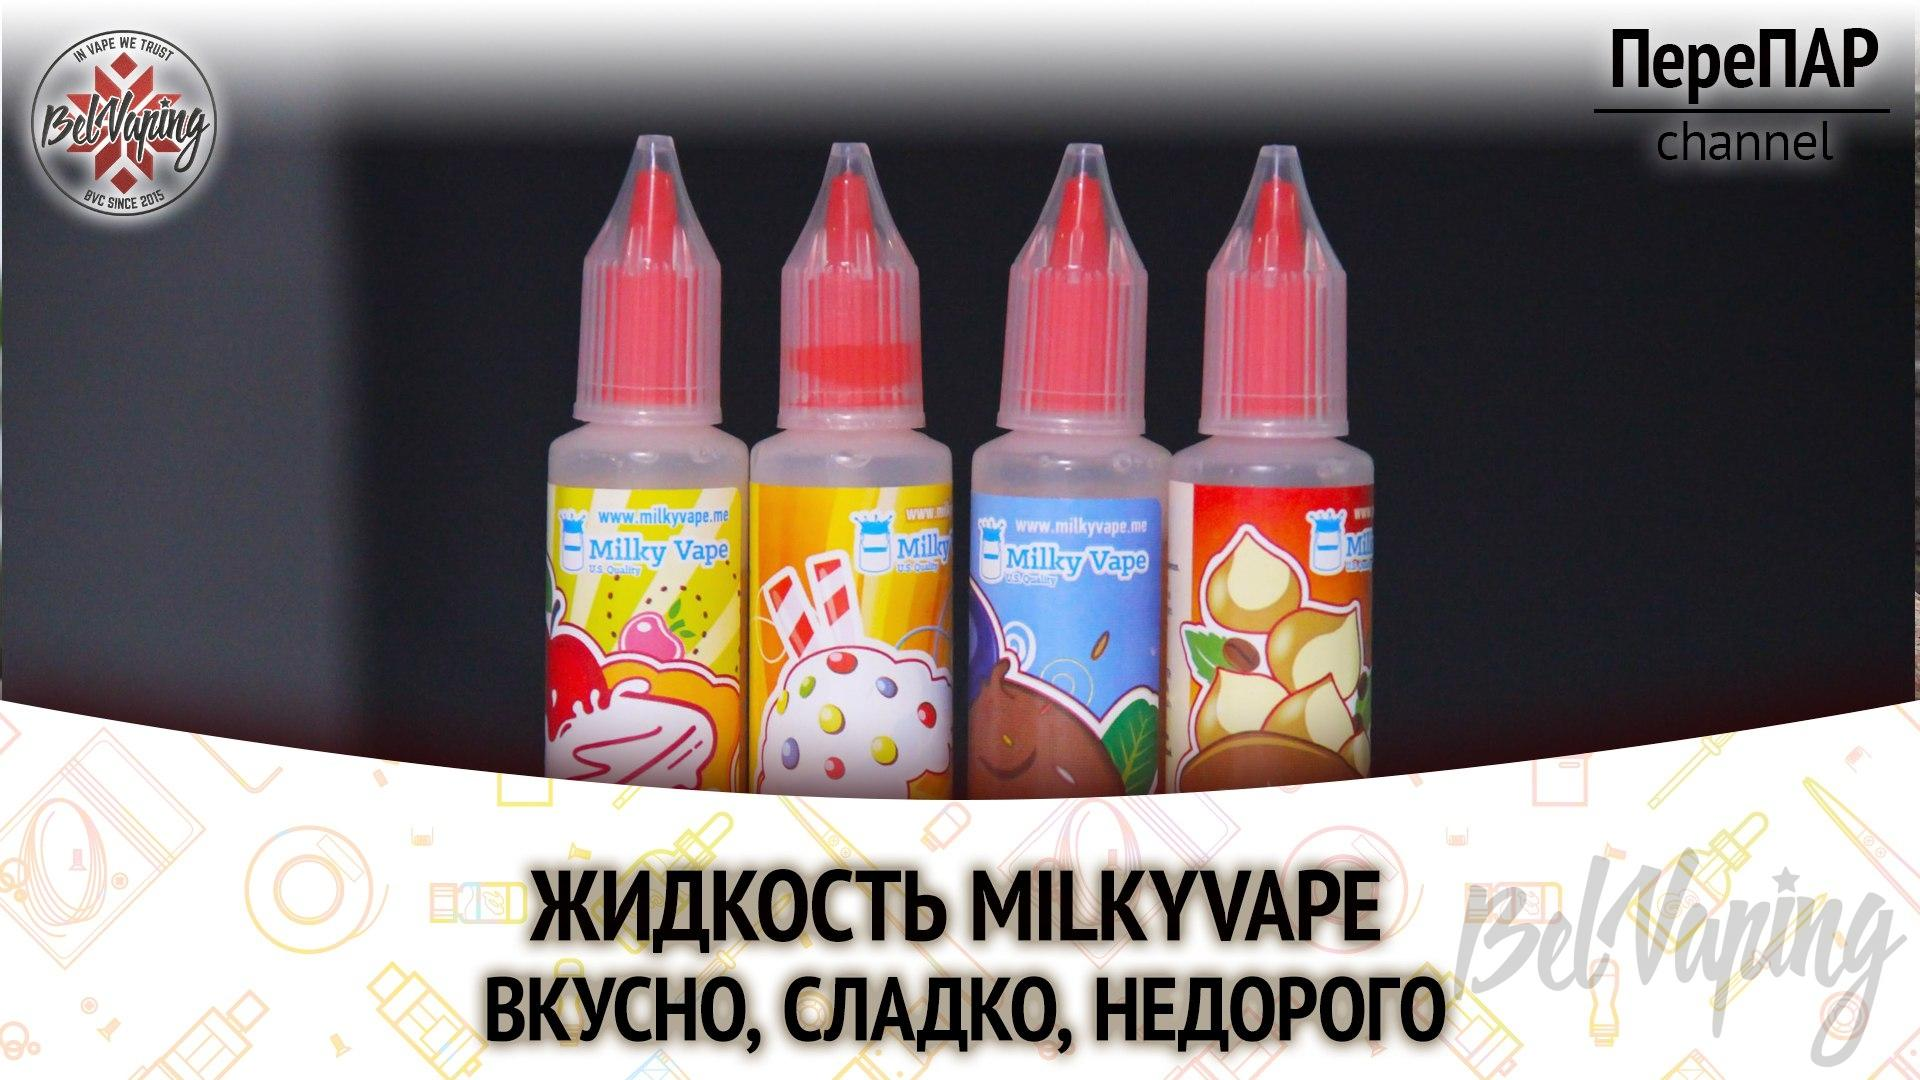 Обзор жидкости для вейпинга Milky Vape